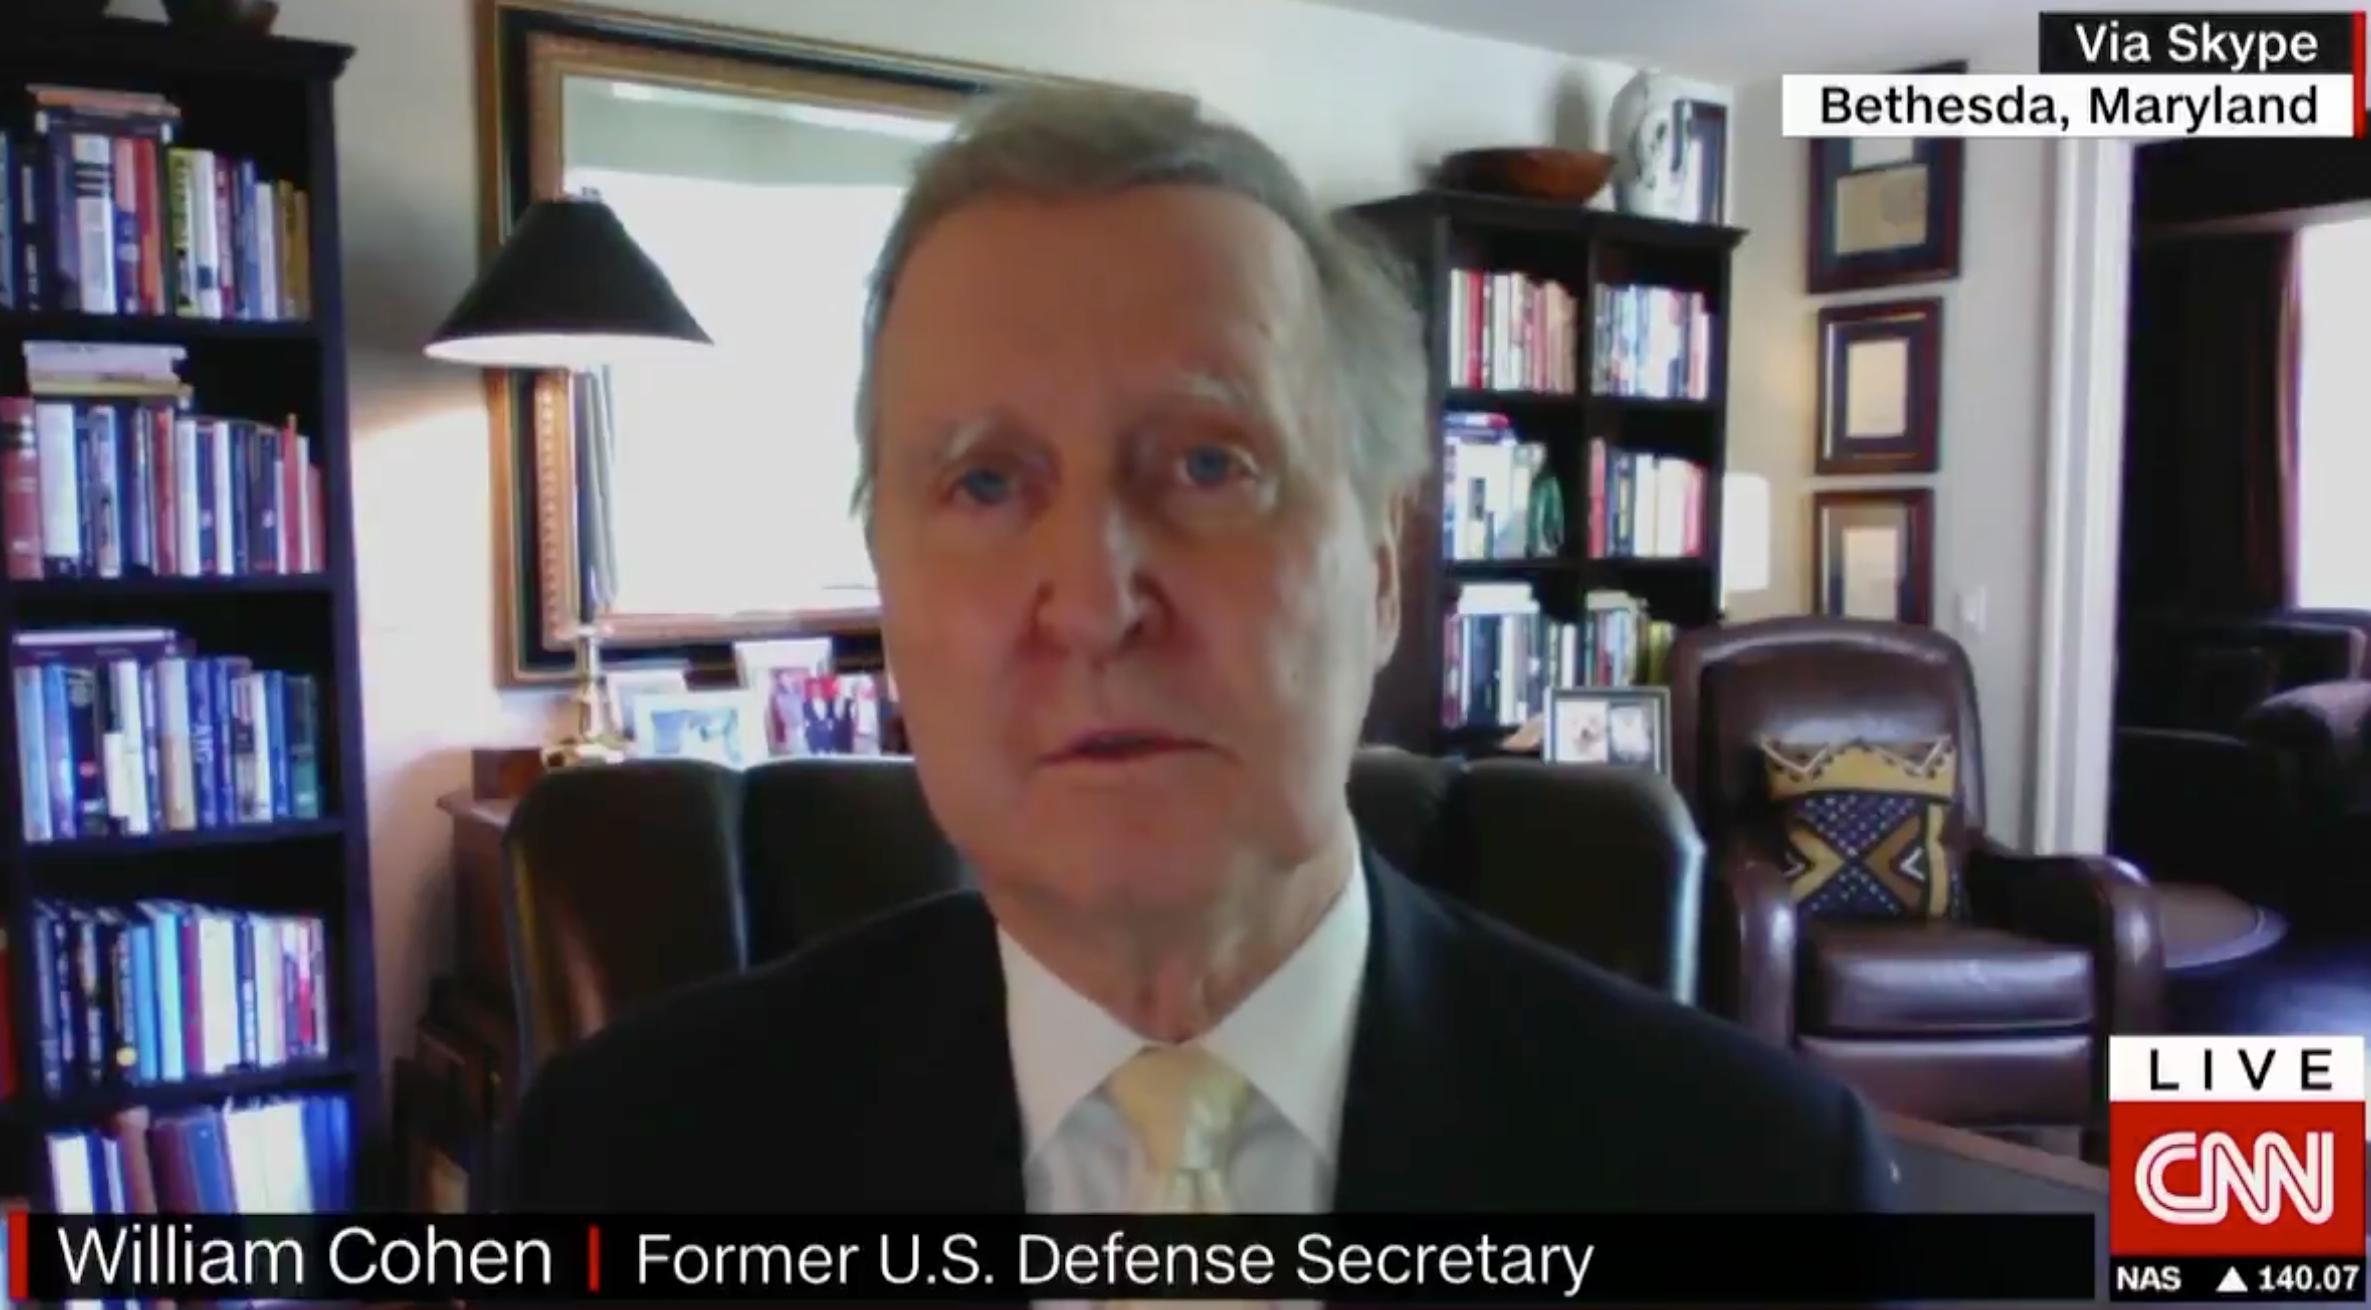 Trump 'taking us down road to tyranny', says former defence secretary